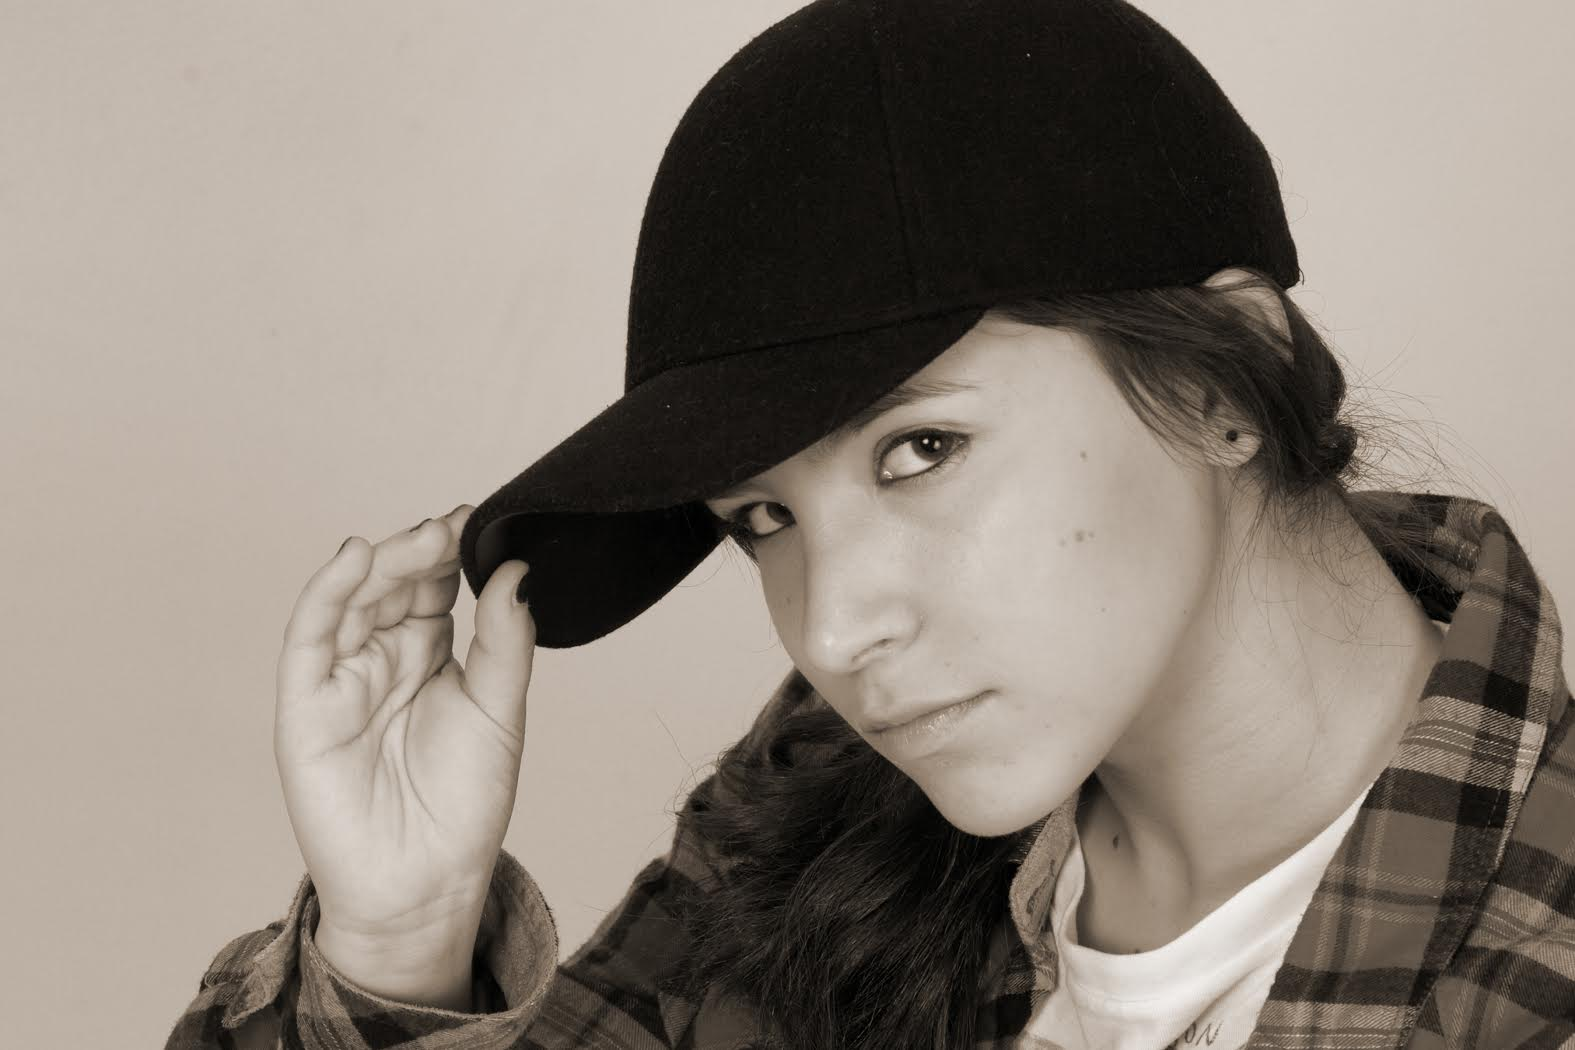 Ariel Bavly, teen pop protege: 'Respect, I ain't some dumb brunette.' - scallywagandvagabond